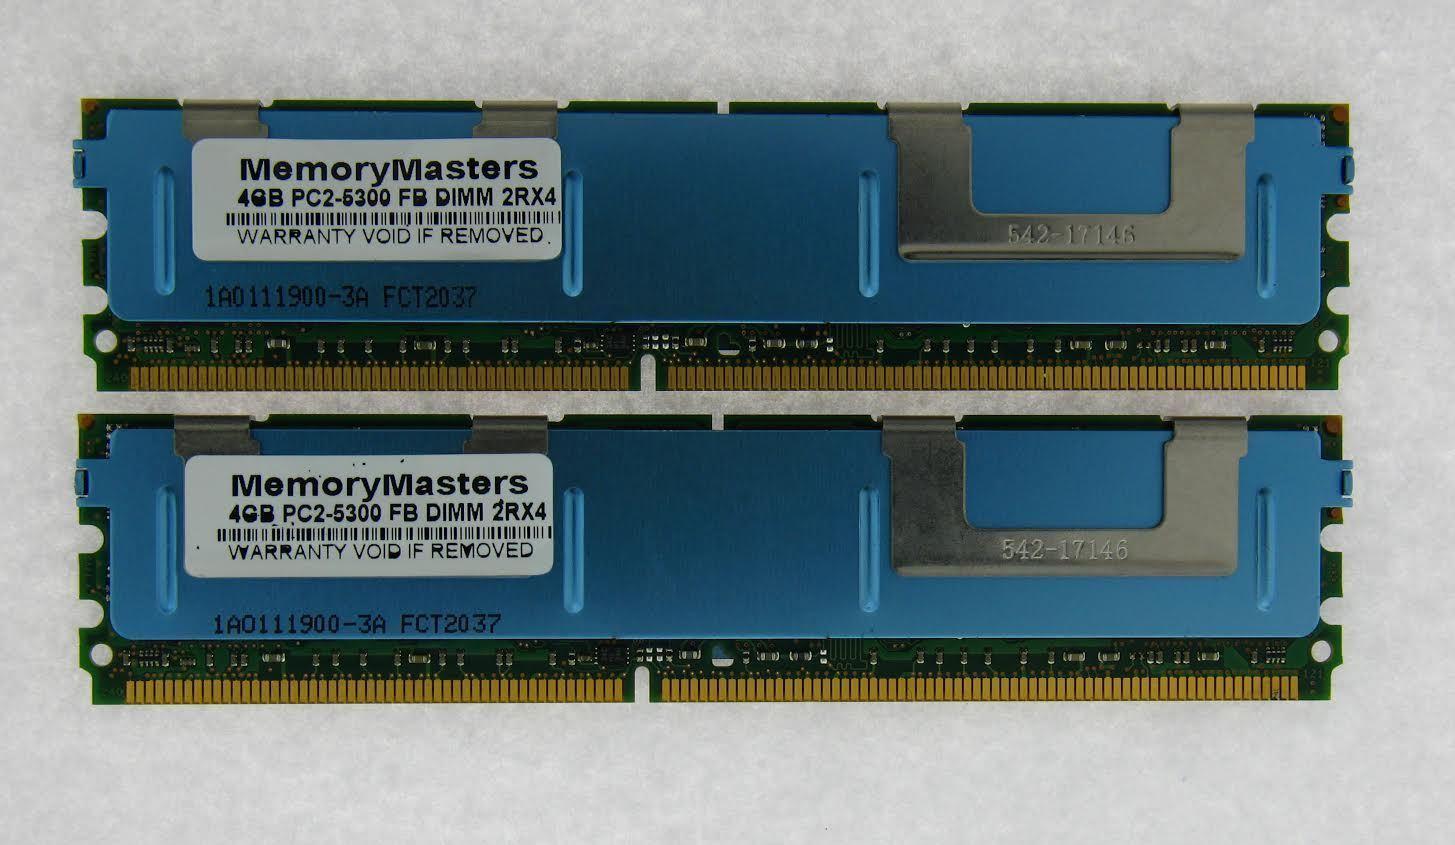 8GB 2X4GB KIT DELL FBDIMM PowerEdge 2900 M600 2950 III 2900 R900 RAM MEMORY